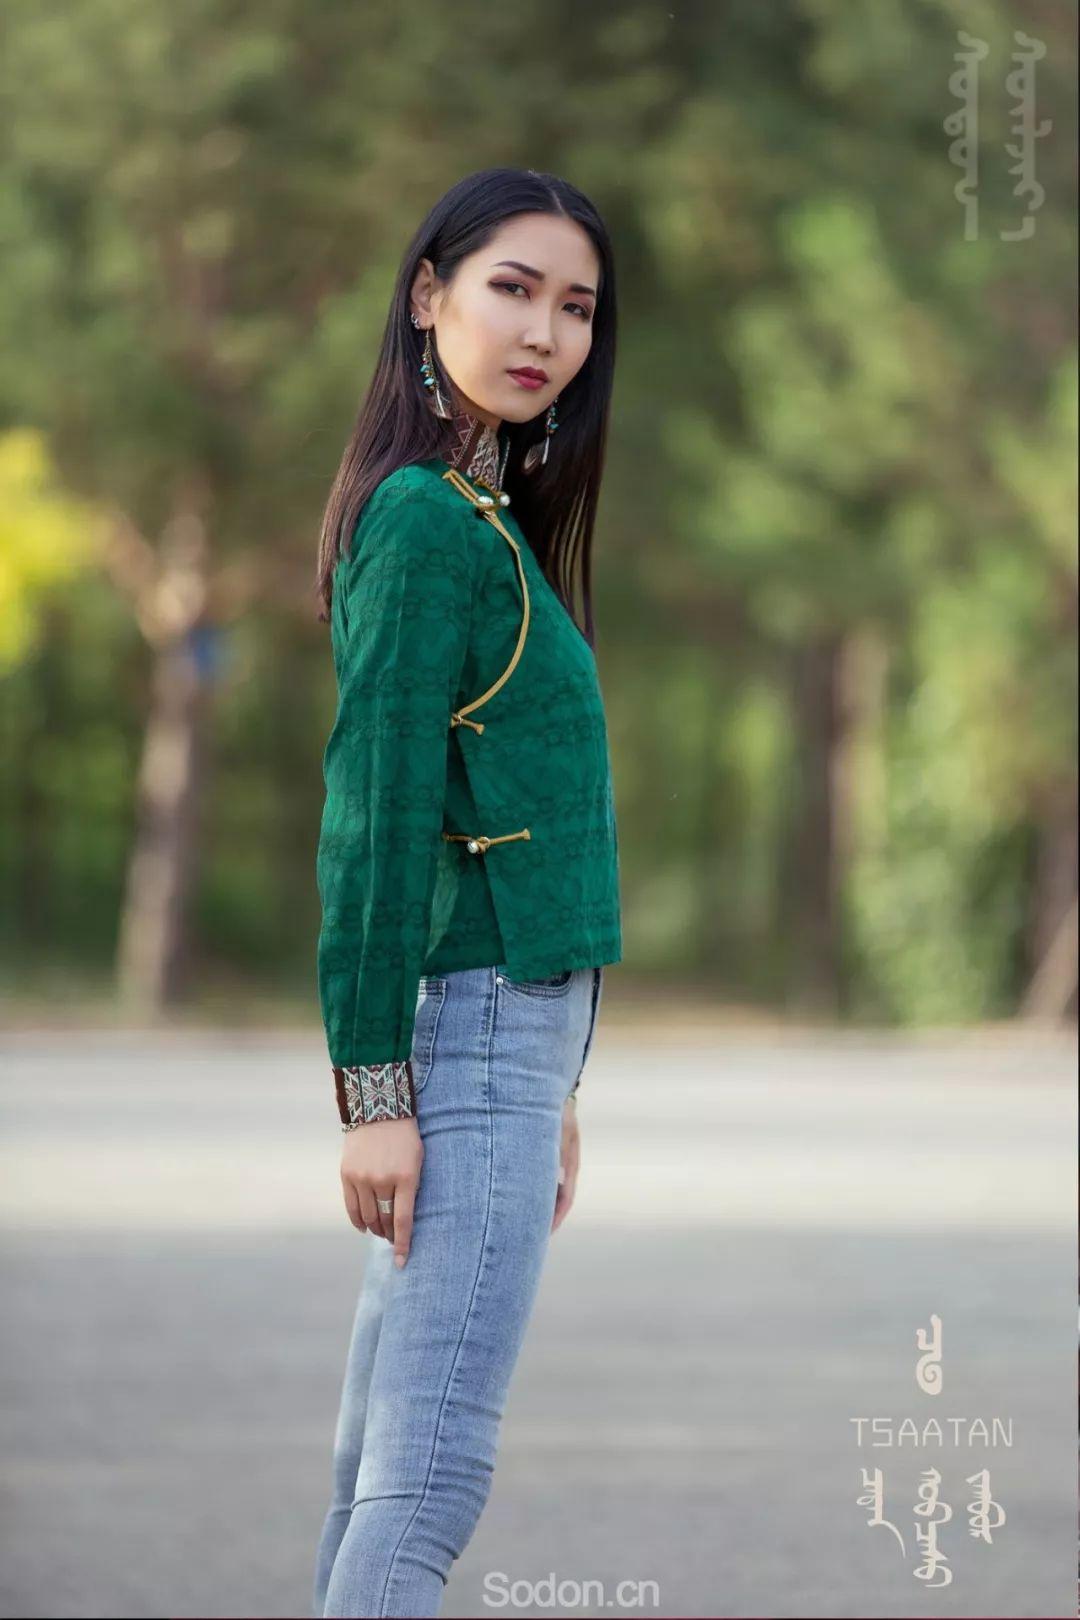 TSAATAN蒙古时装 2019夏季新款首发 第98张